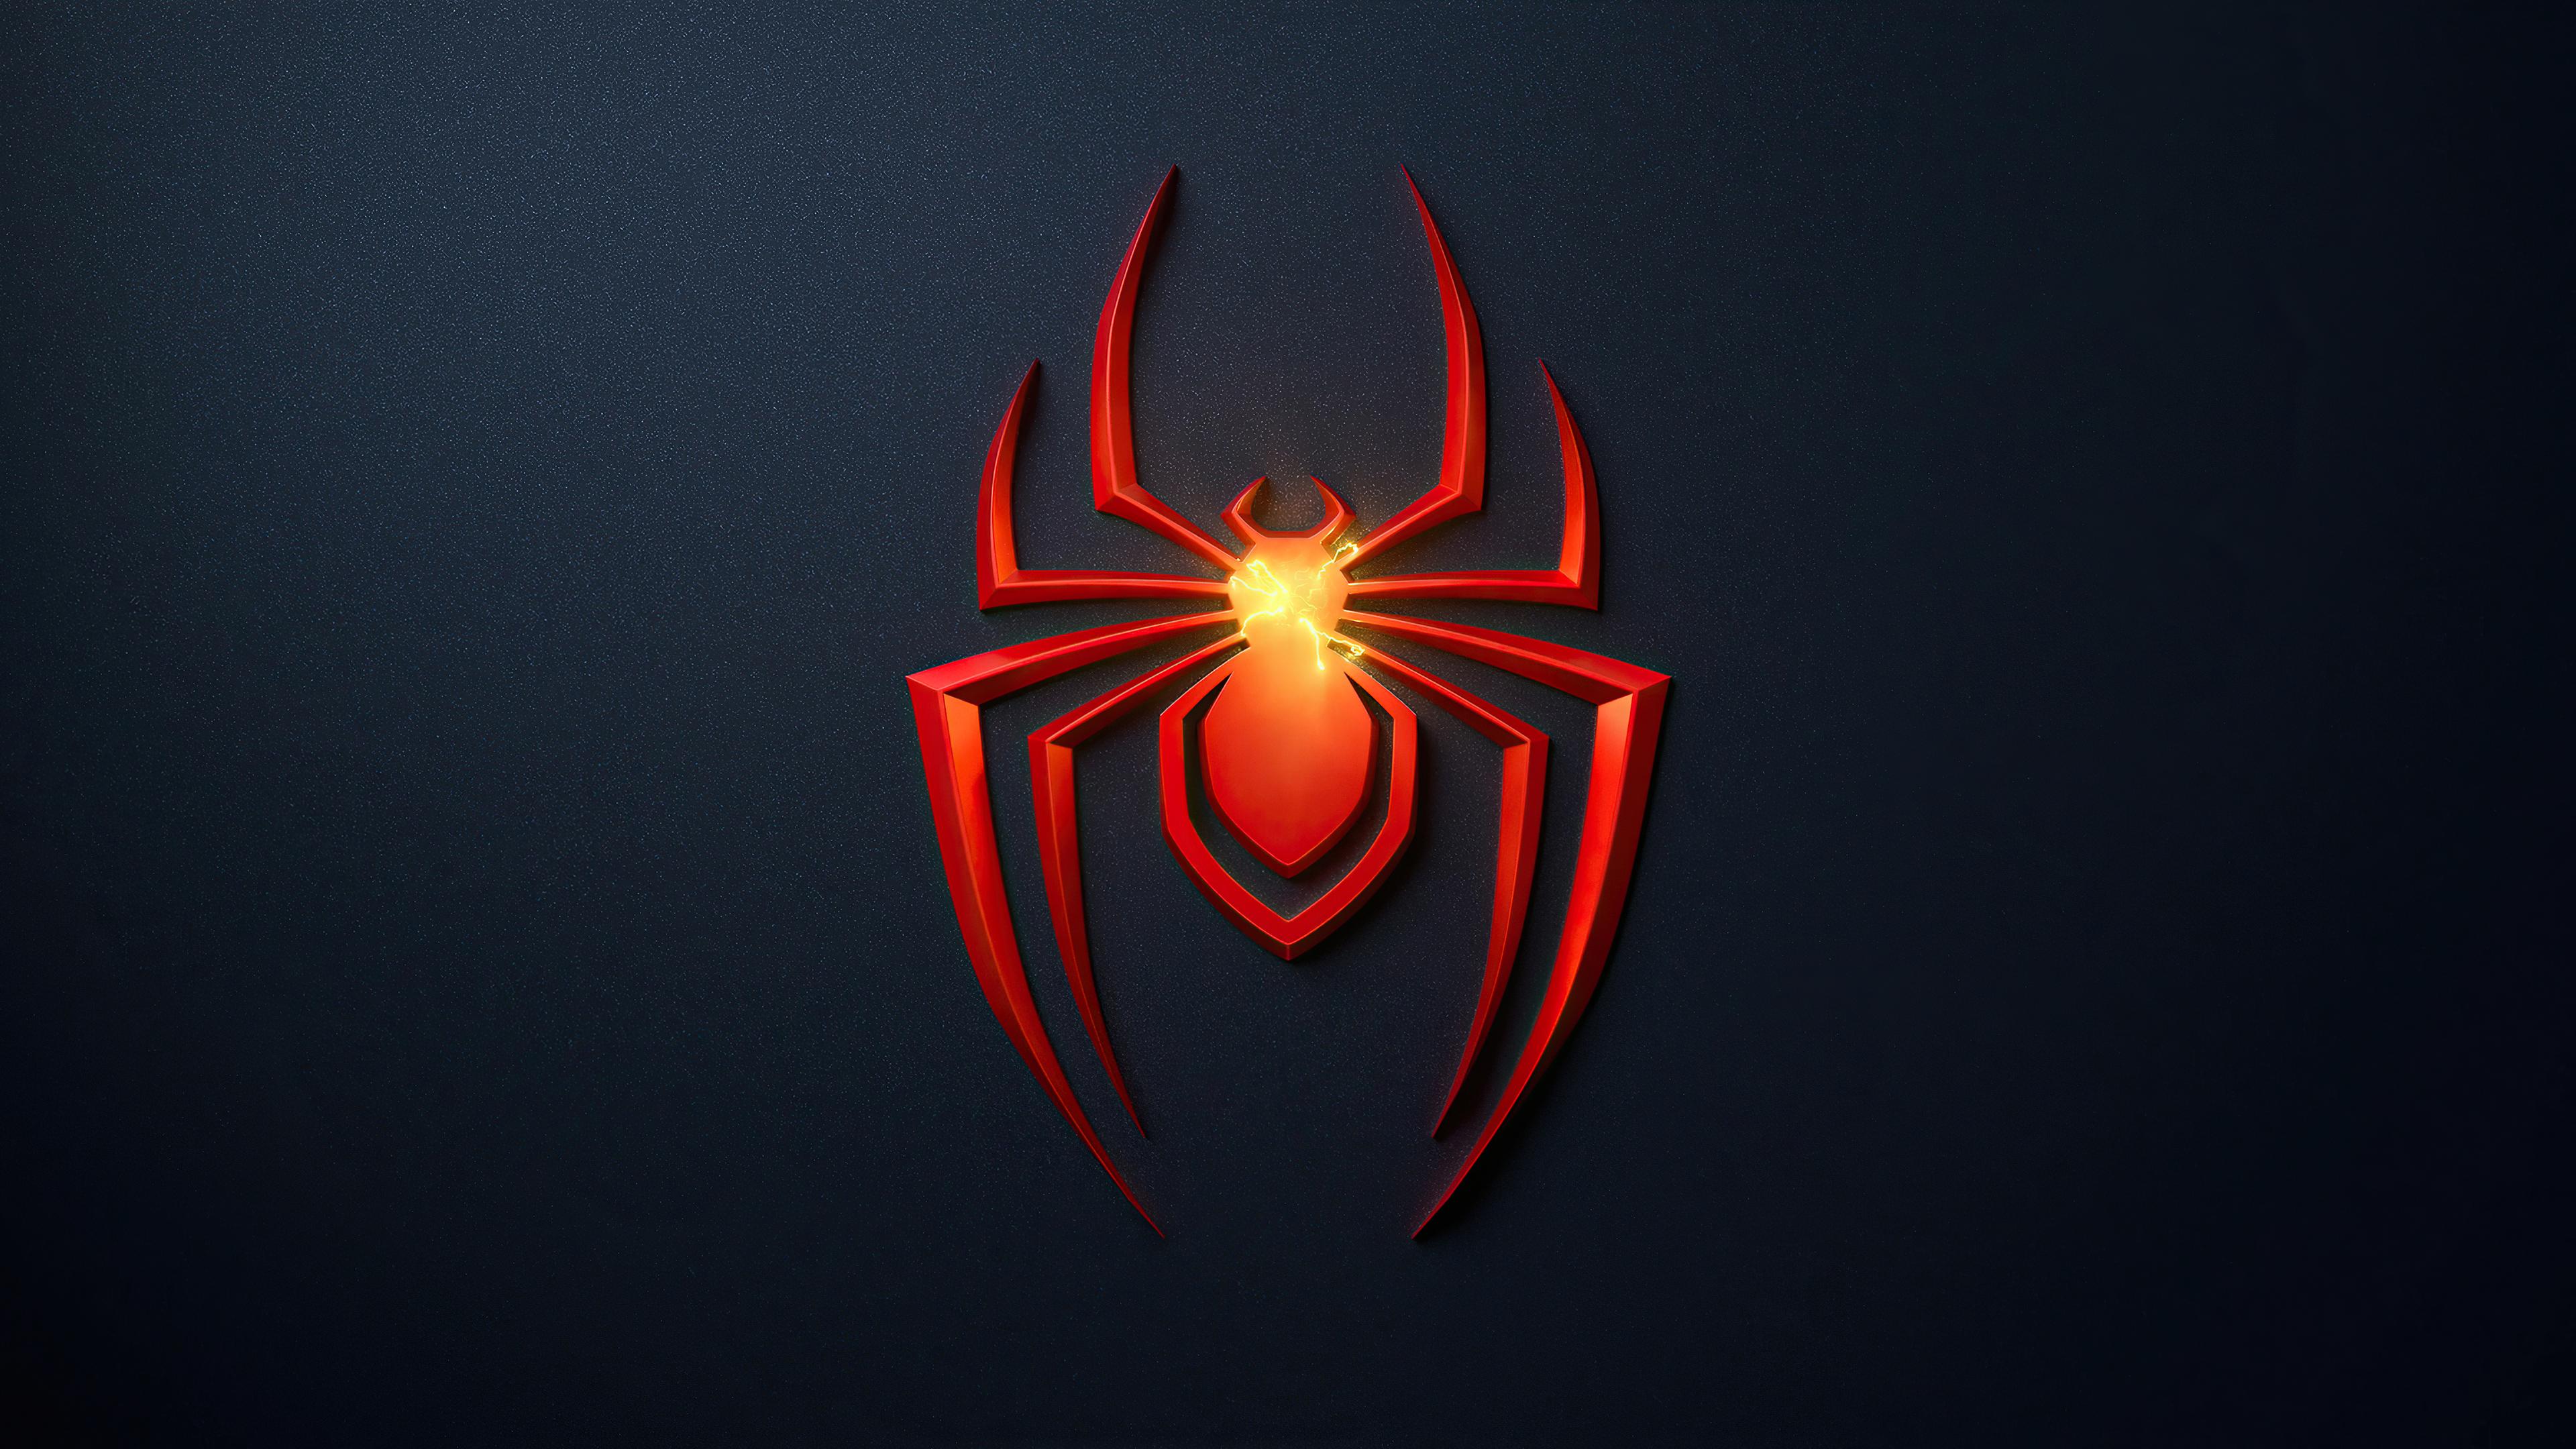 Spider Man Miles Morales 4k Wallpaper Playstation 5 Dark Background 2020 Games Games 1490